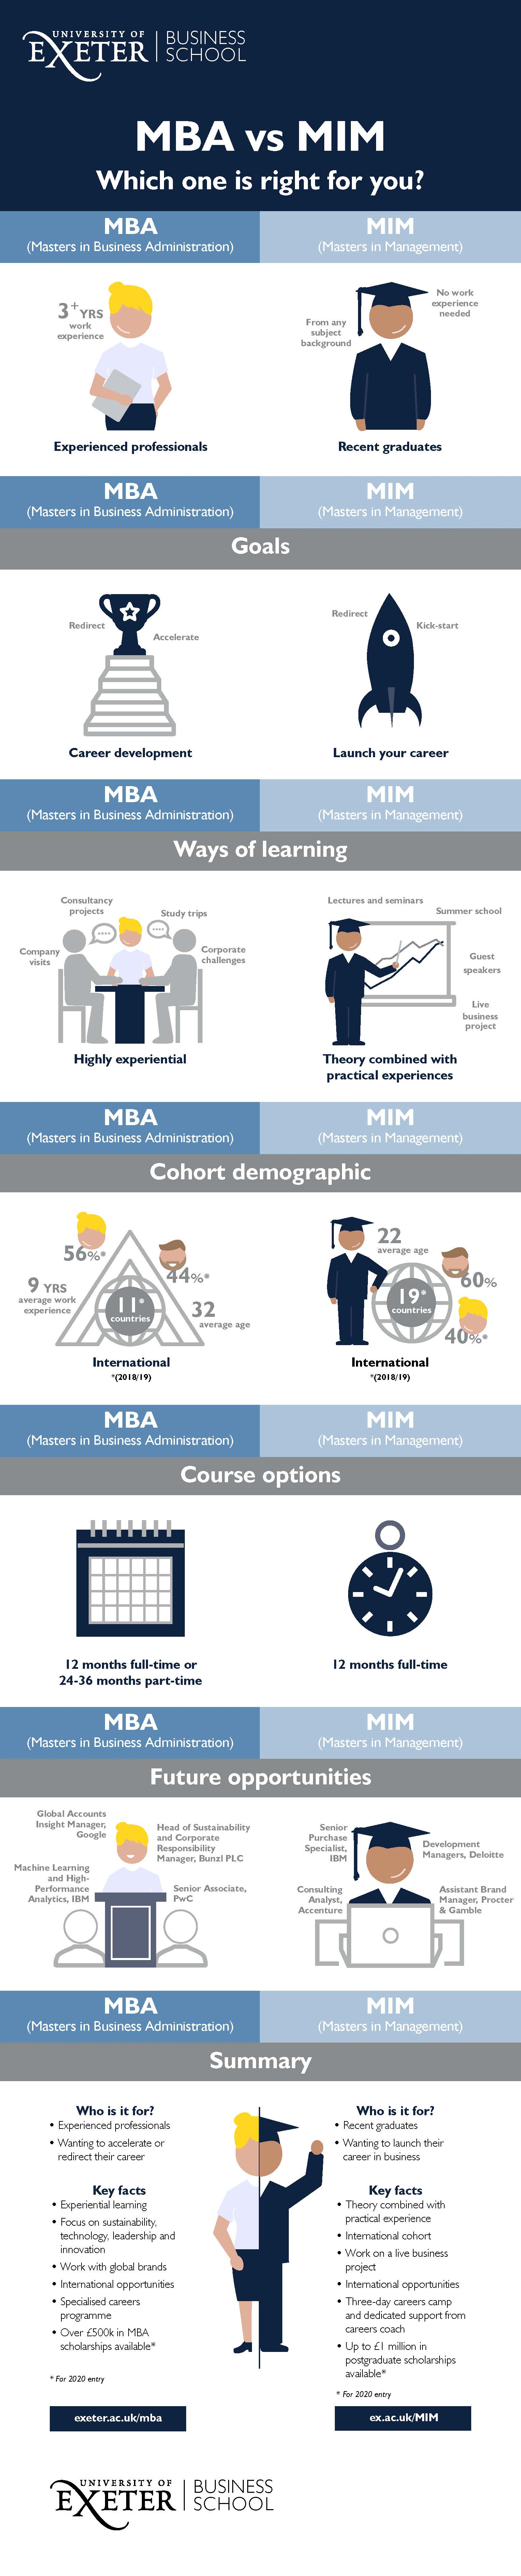 MBA v MIM Infographic FINAL